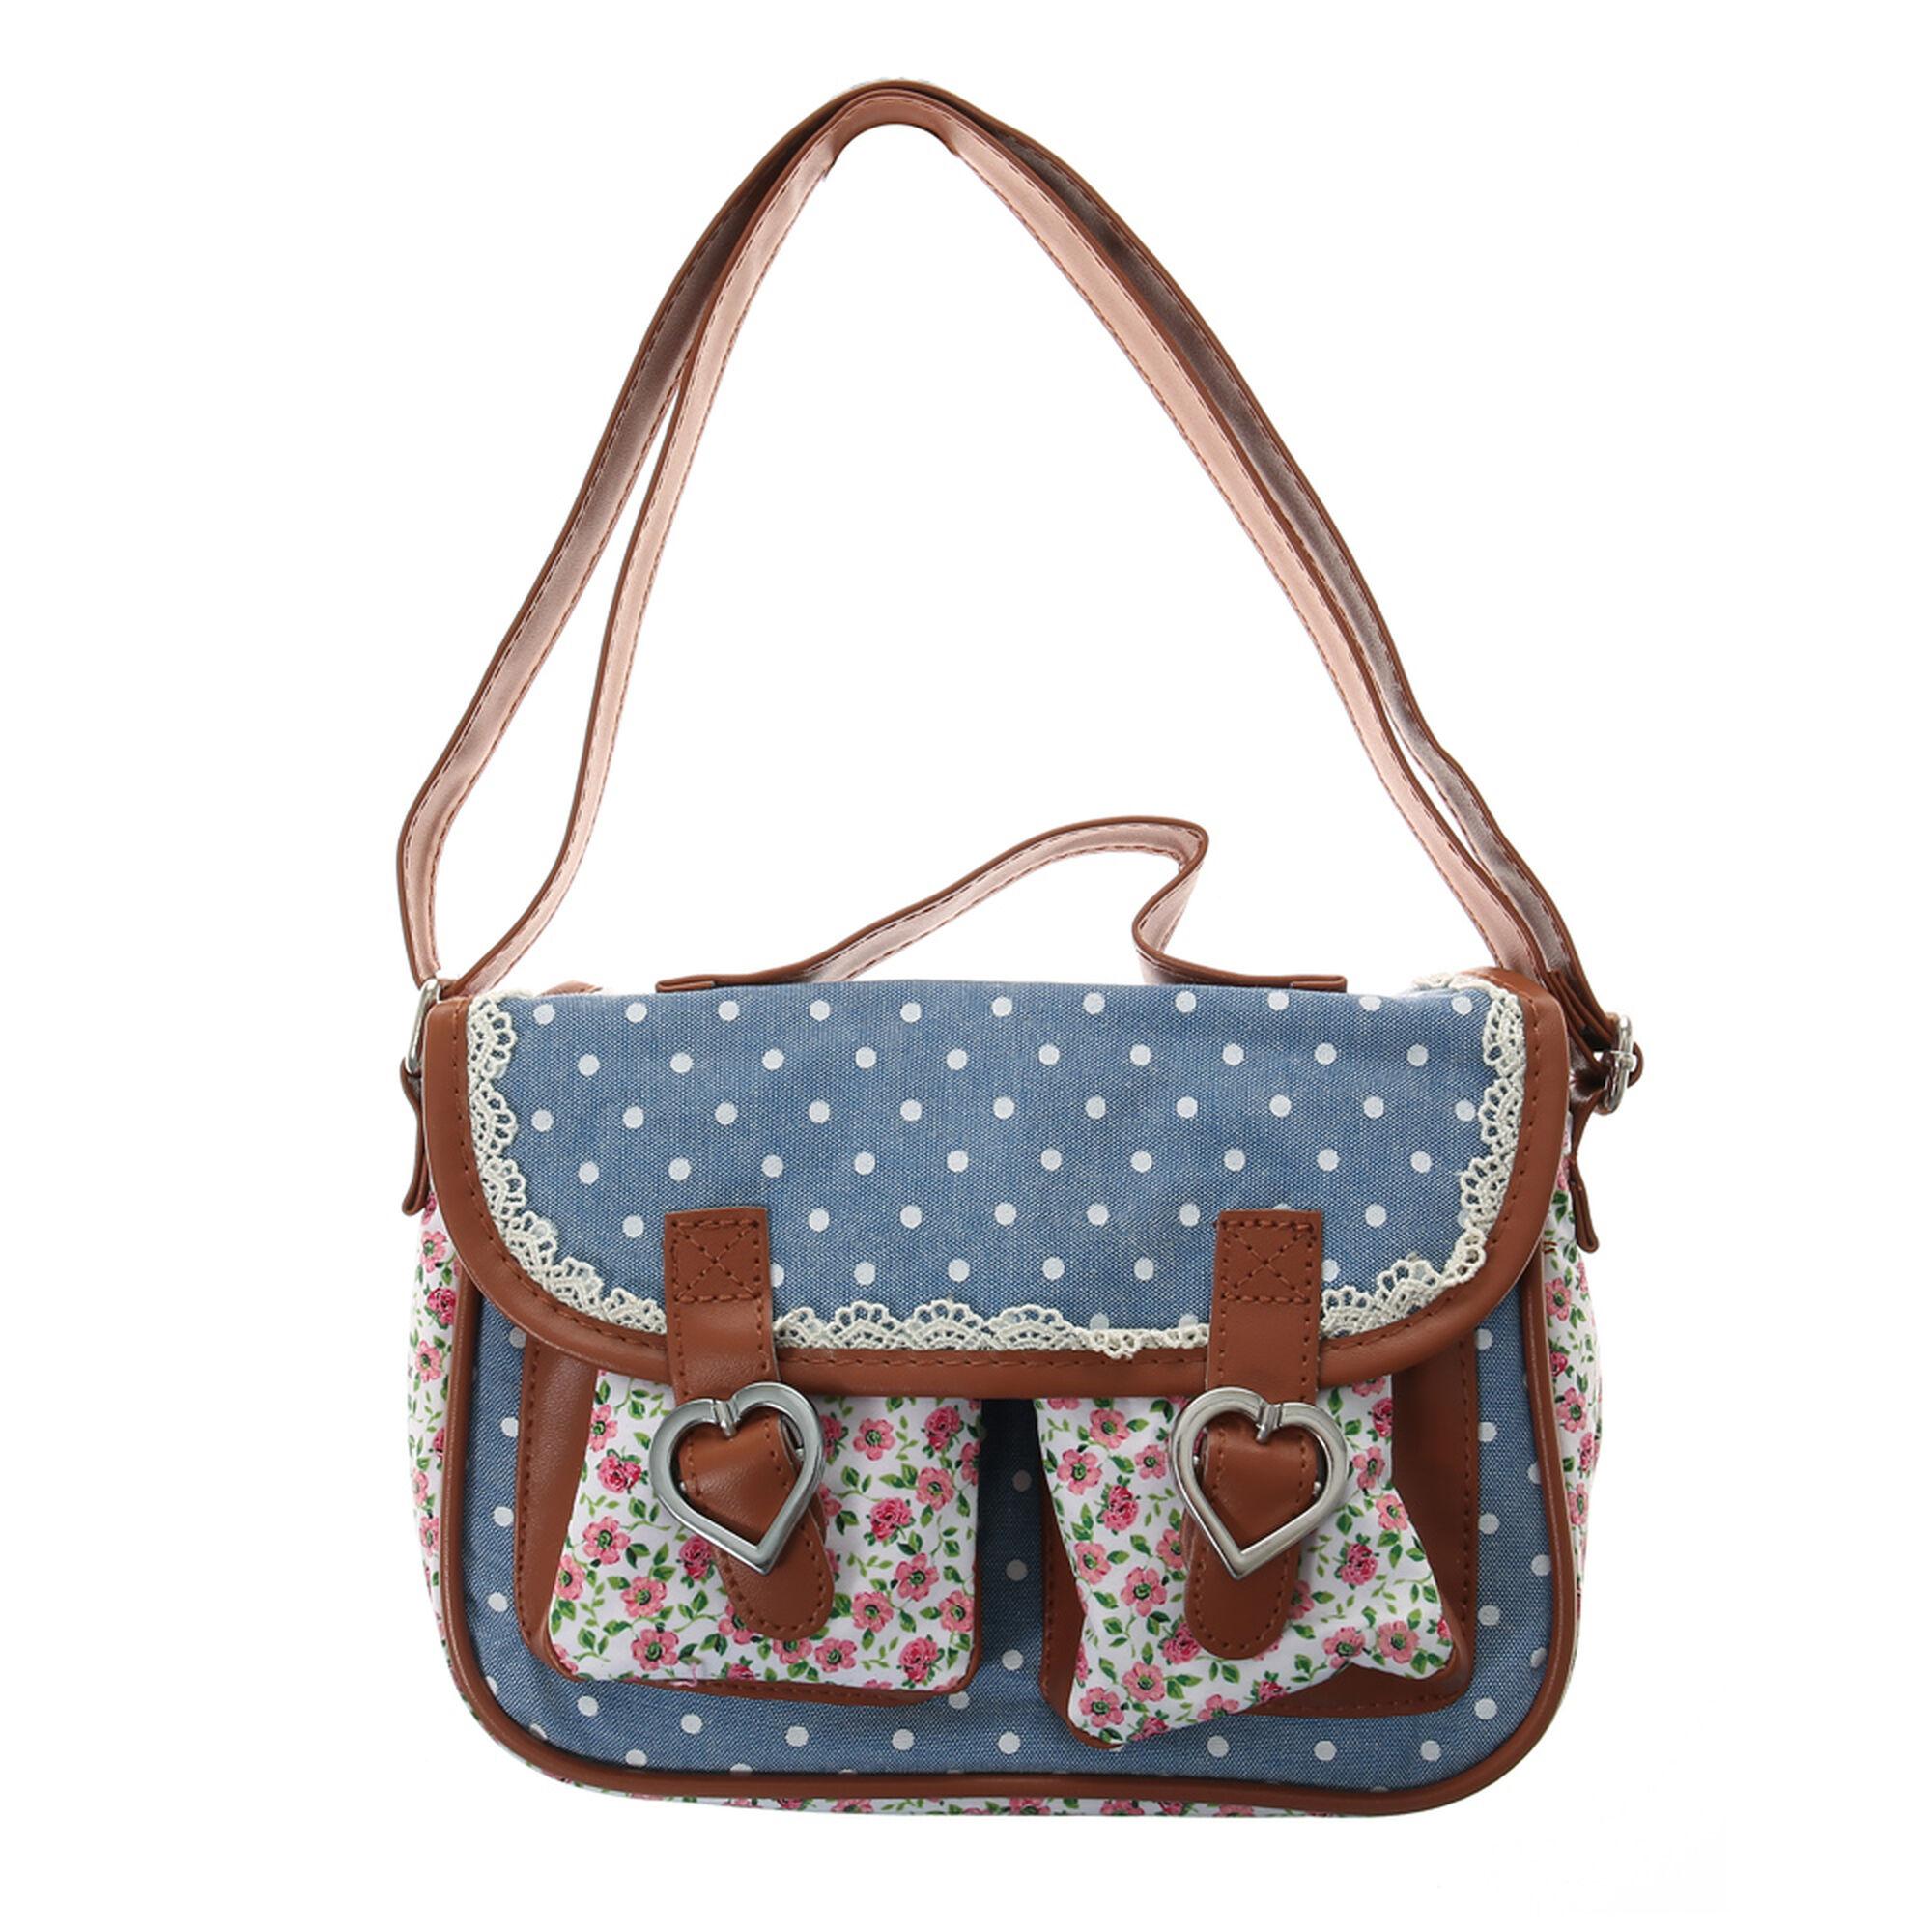 Kids Floral And Polka Dot Blue Crossbody Bag | Claireu0026#39;s US